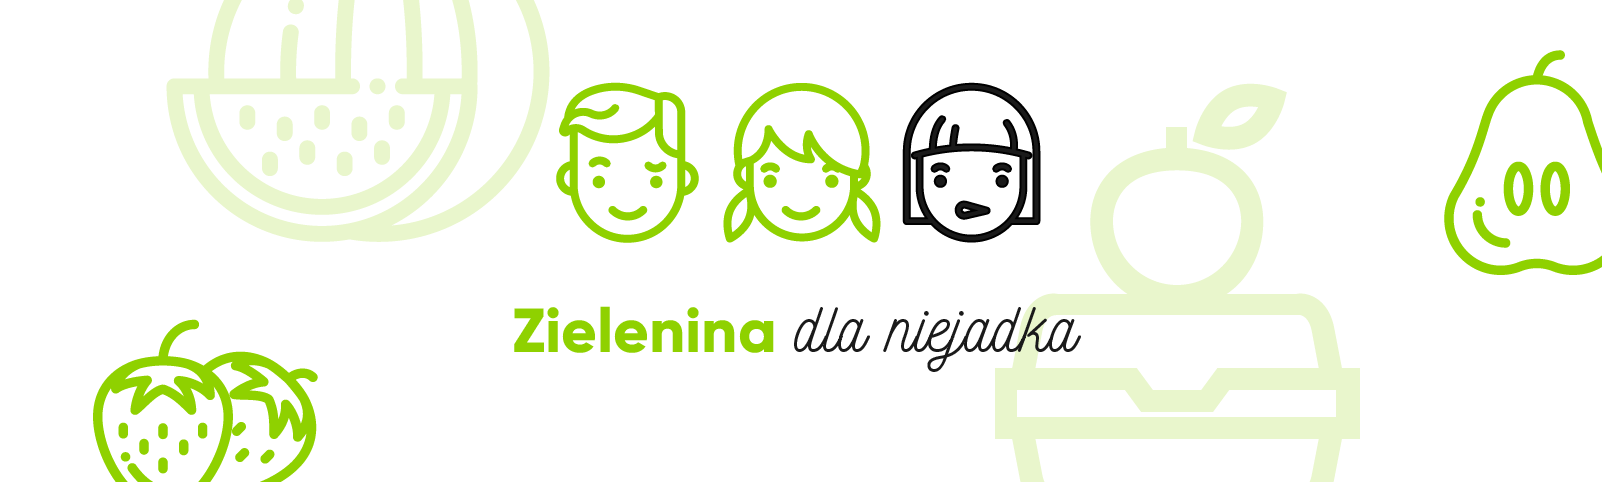 zielenina_facebook_group-12